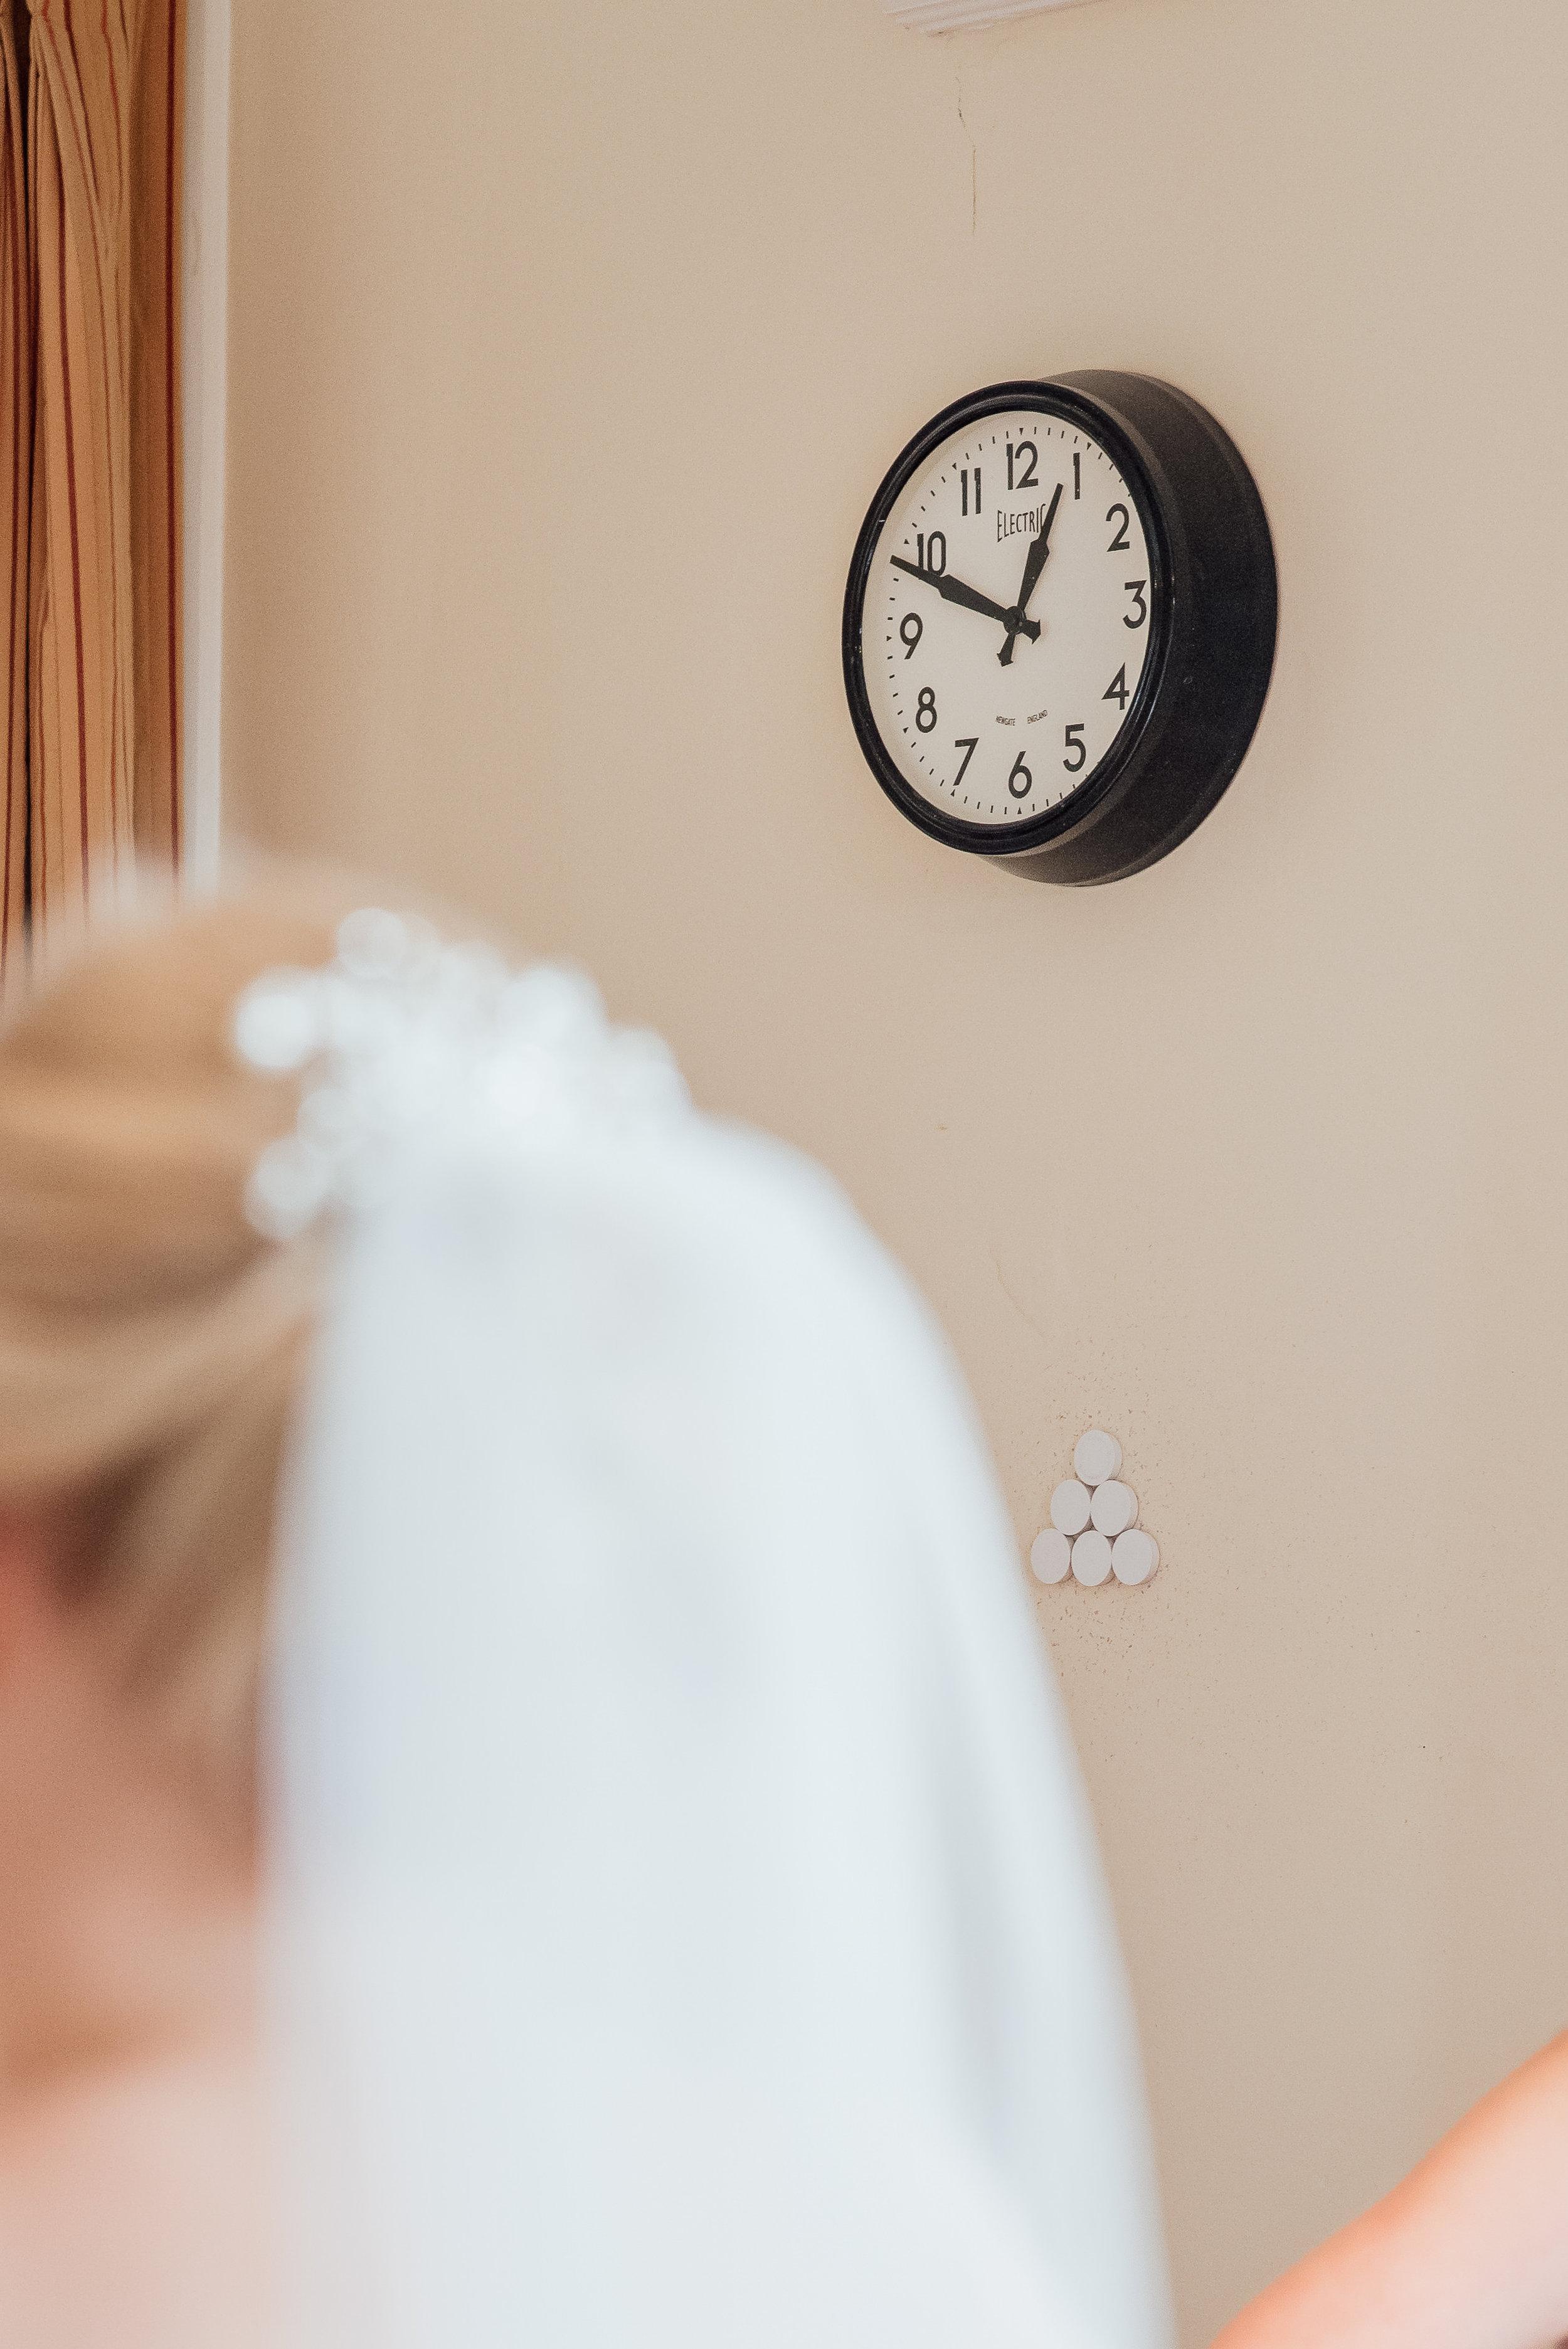 Amy James Photography - Hampshire Wedding Photographer - Fleet Wedding Photographer - The Elvetham Wedding - bridal preparations -Elvetham Wedding Photographer - Hampshire Wedding Venue - Documentary wedding phohotgrapher - Natural wedding photographer Hampshire